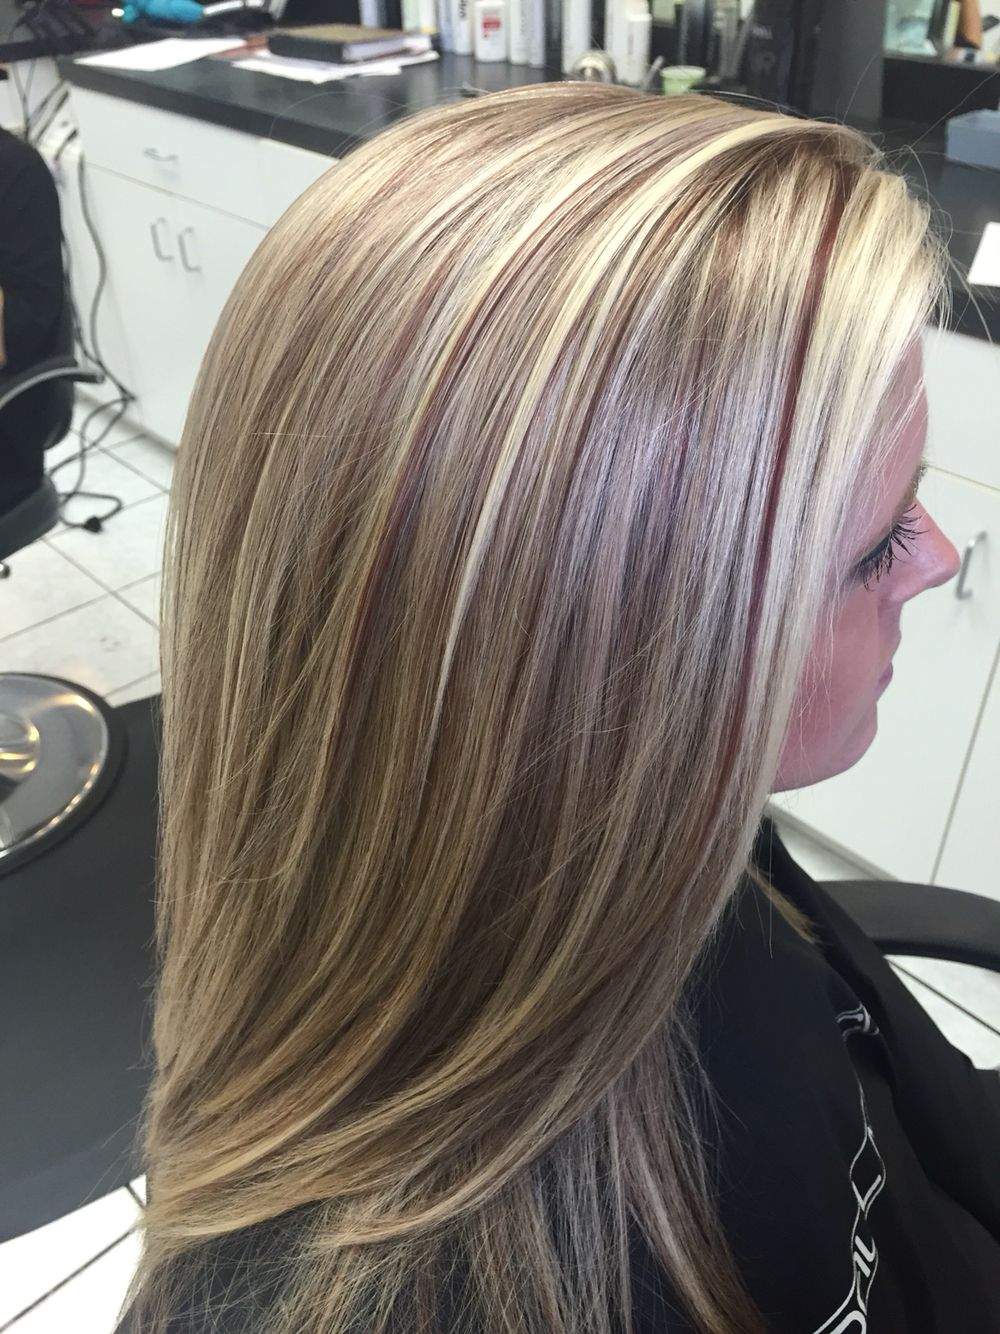 Blonde hair ready for fall My Style Pinterest Hair Blonde